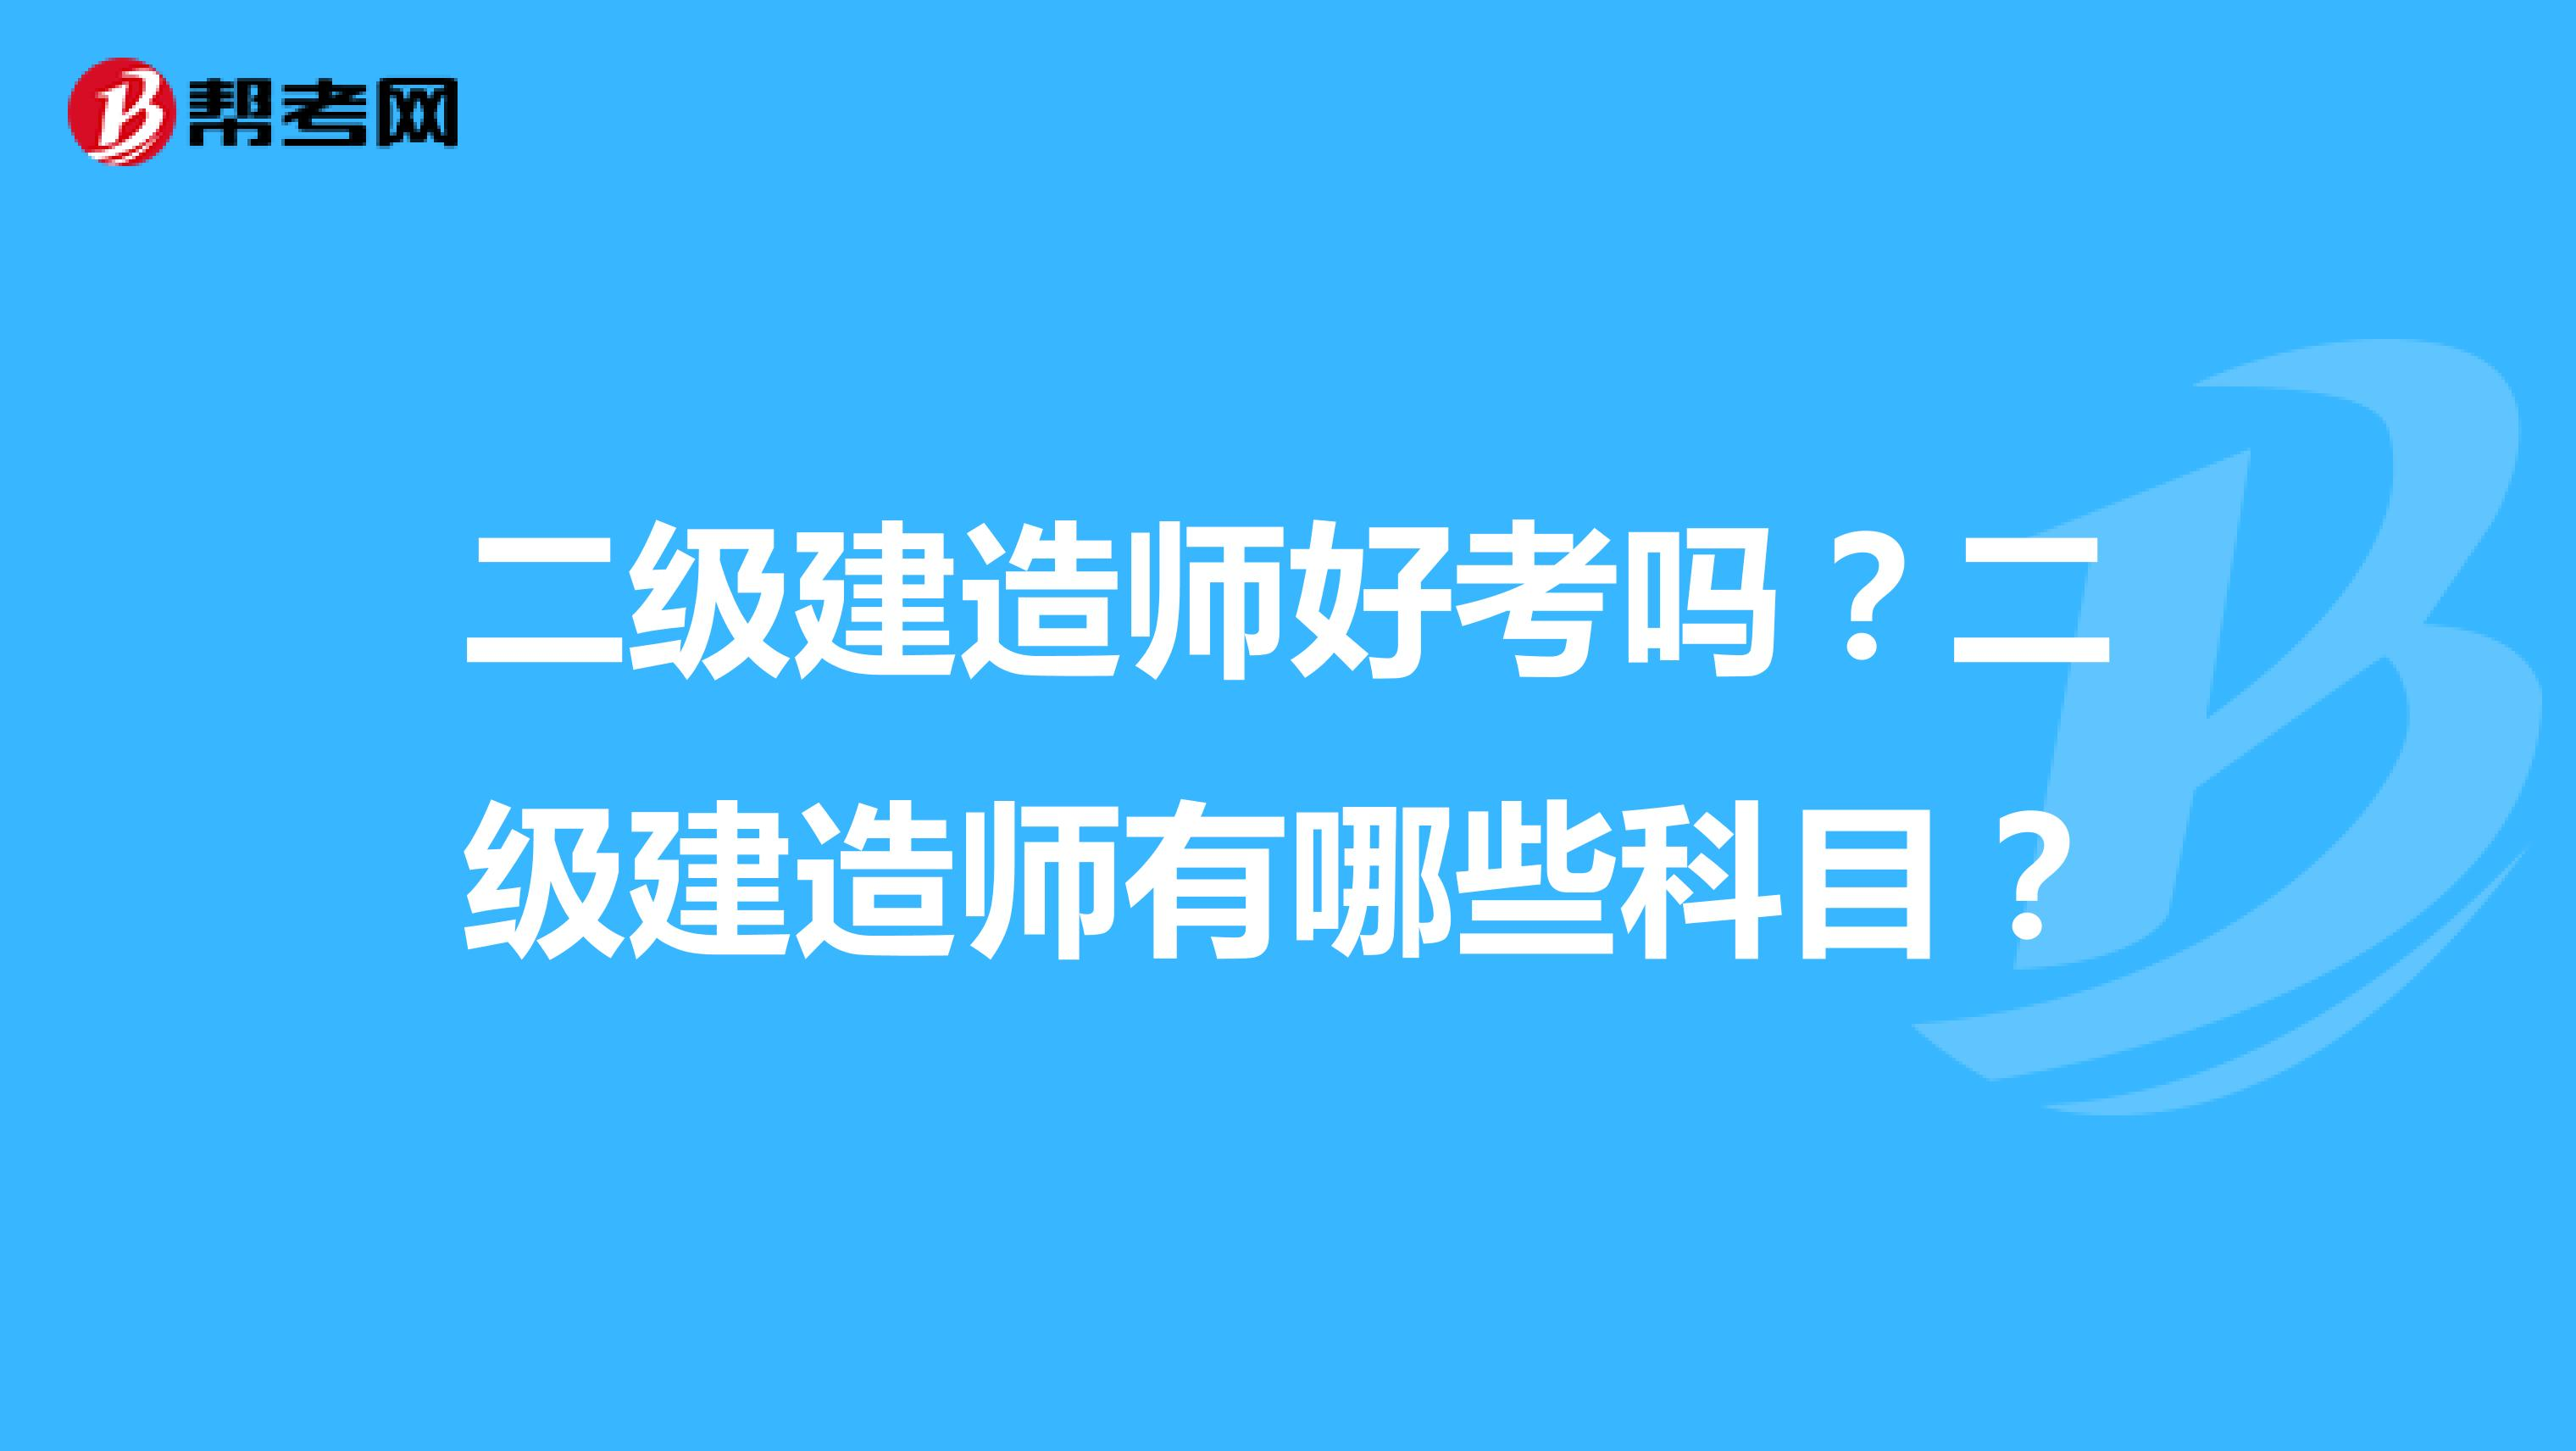 (hot88体育官网)二级建造师好考吗?(hot88体育官网)二级建造师有哪些科目?